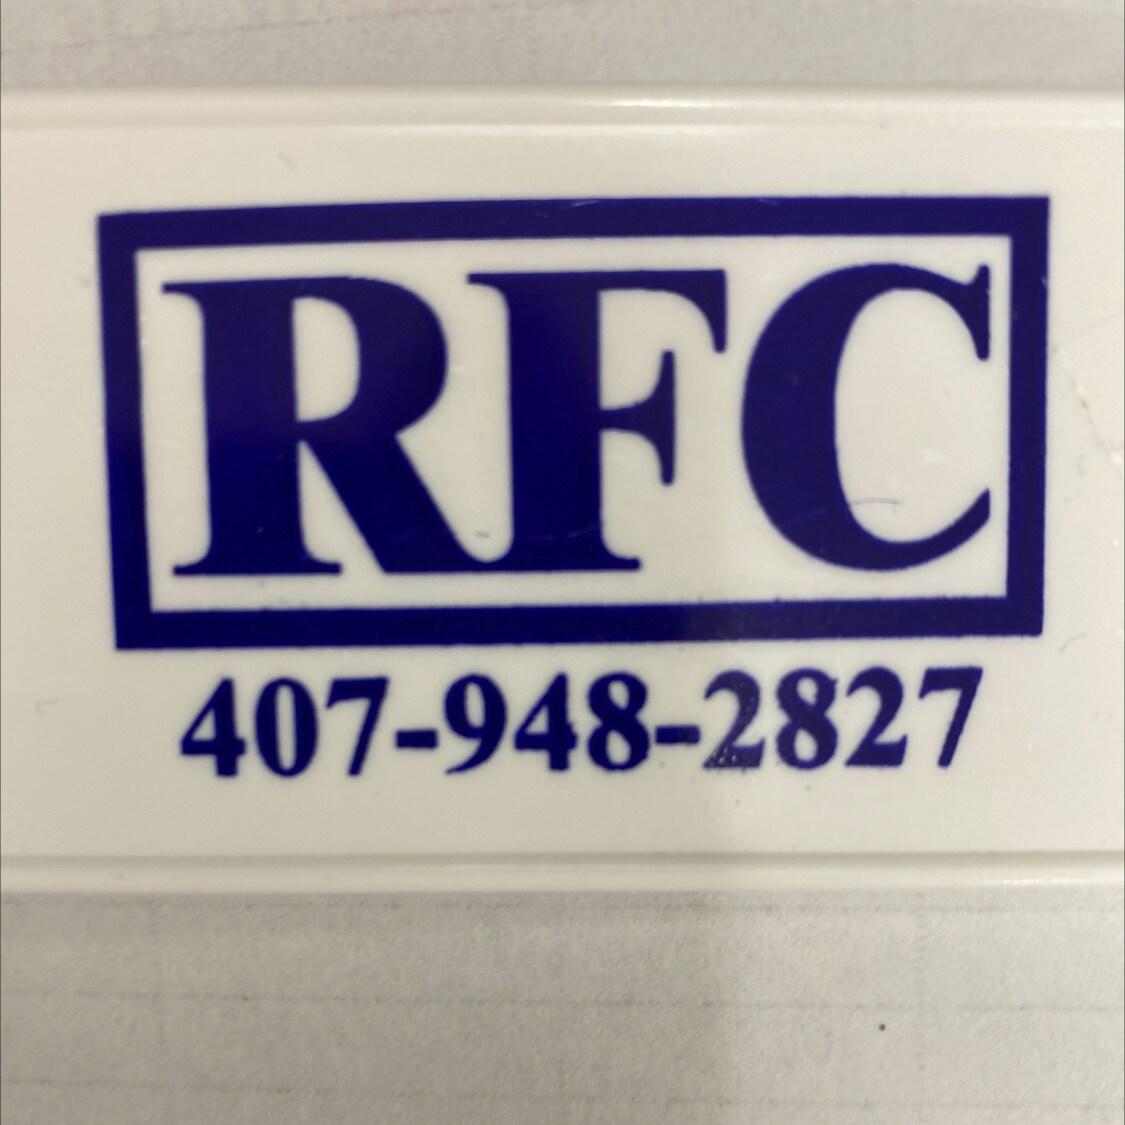 RFC Group logo